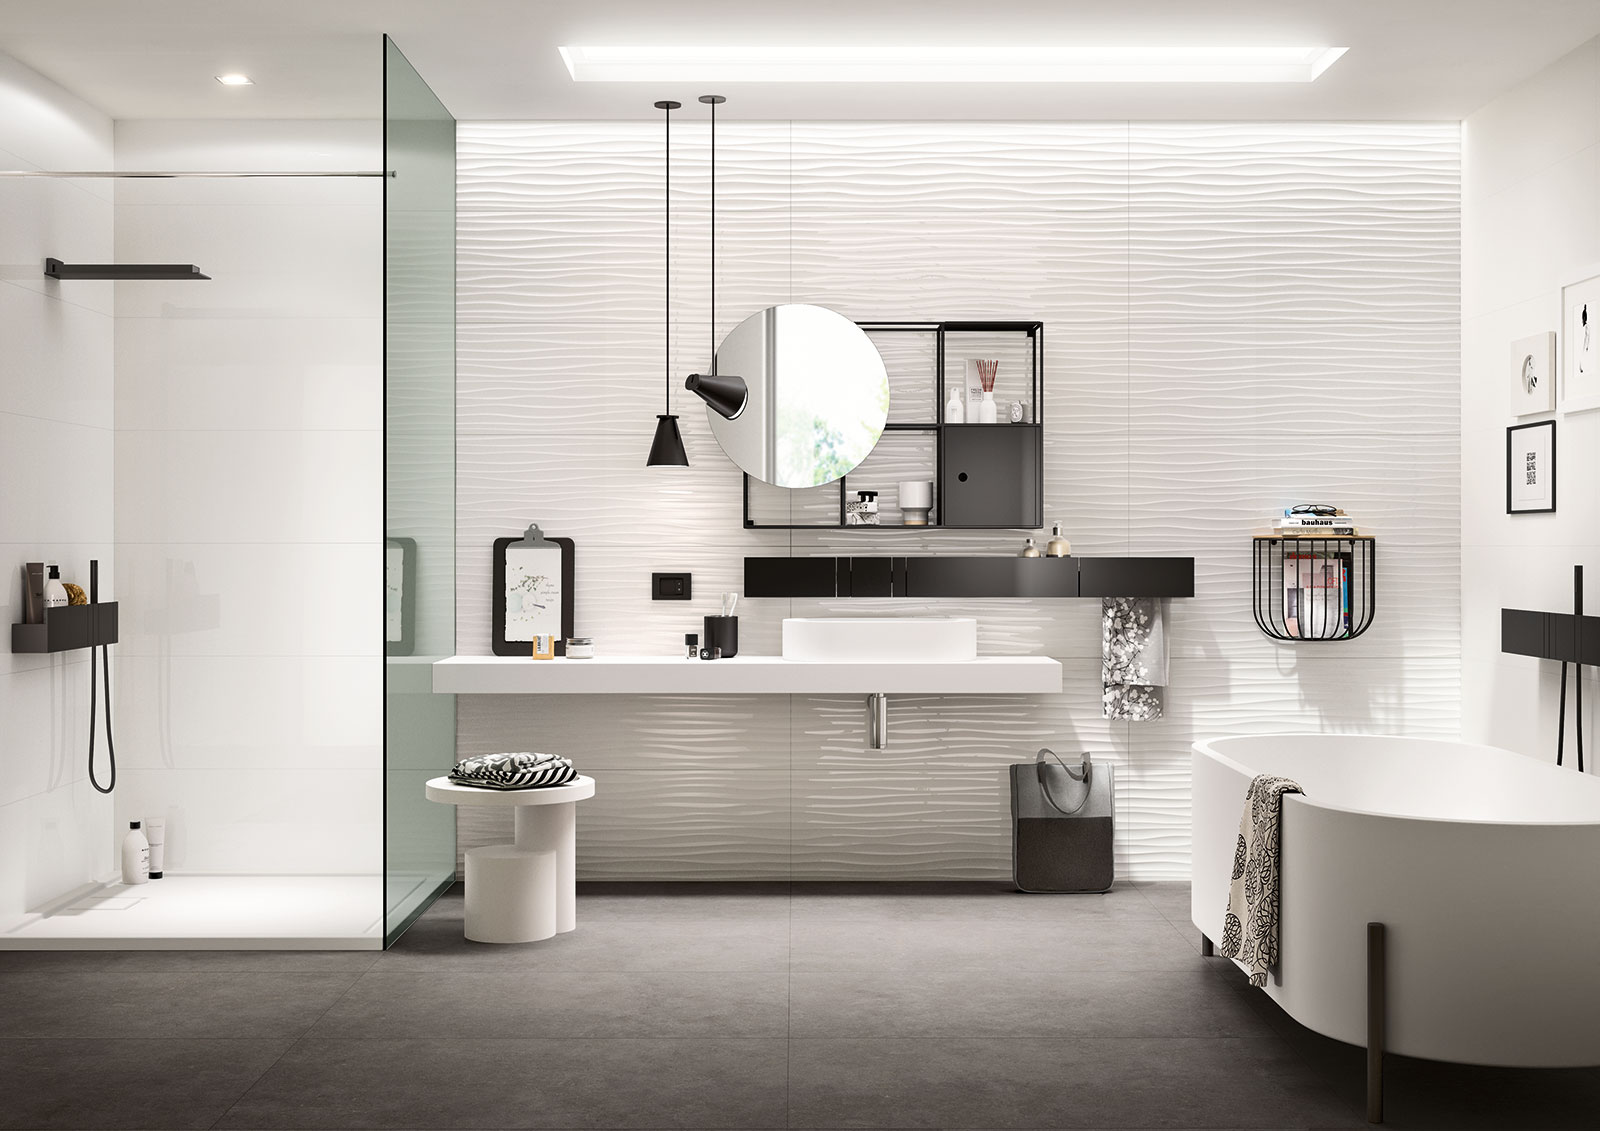 Essenziale ceramica bianca per bagni marazzi - Revestimientos de chimeneas leroy merlin ...